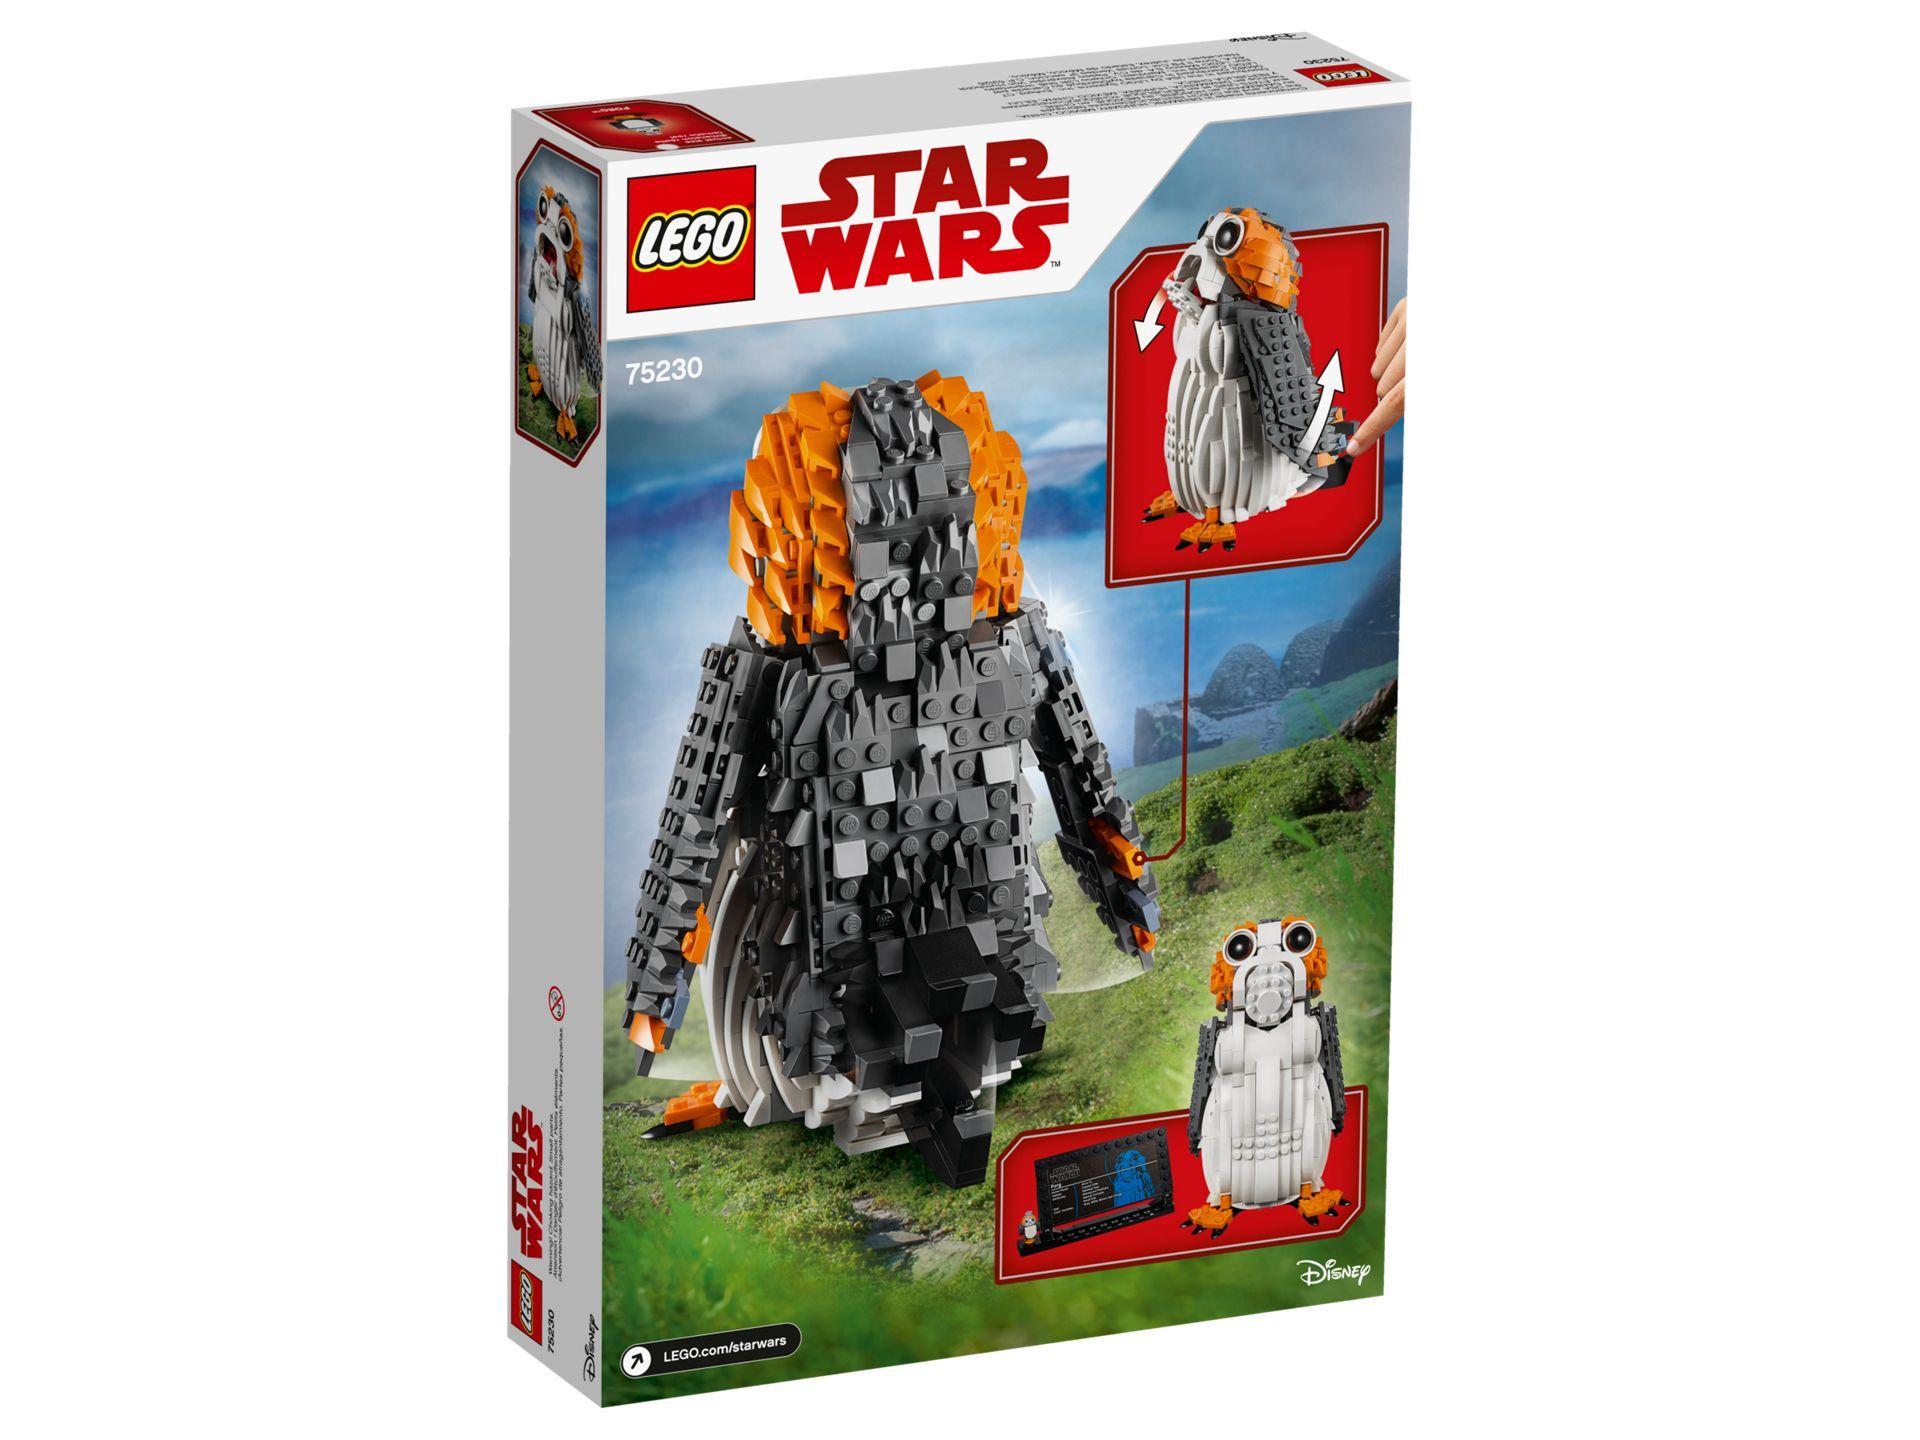 Lego Star Wars Porg 75230 Im Lego Online Shop Gelistet Ab 1